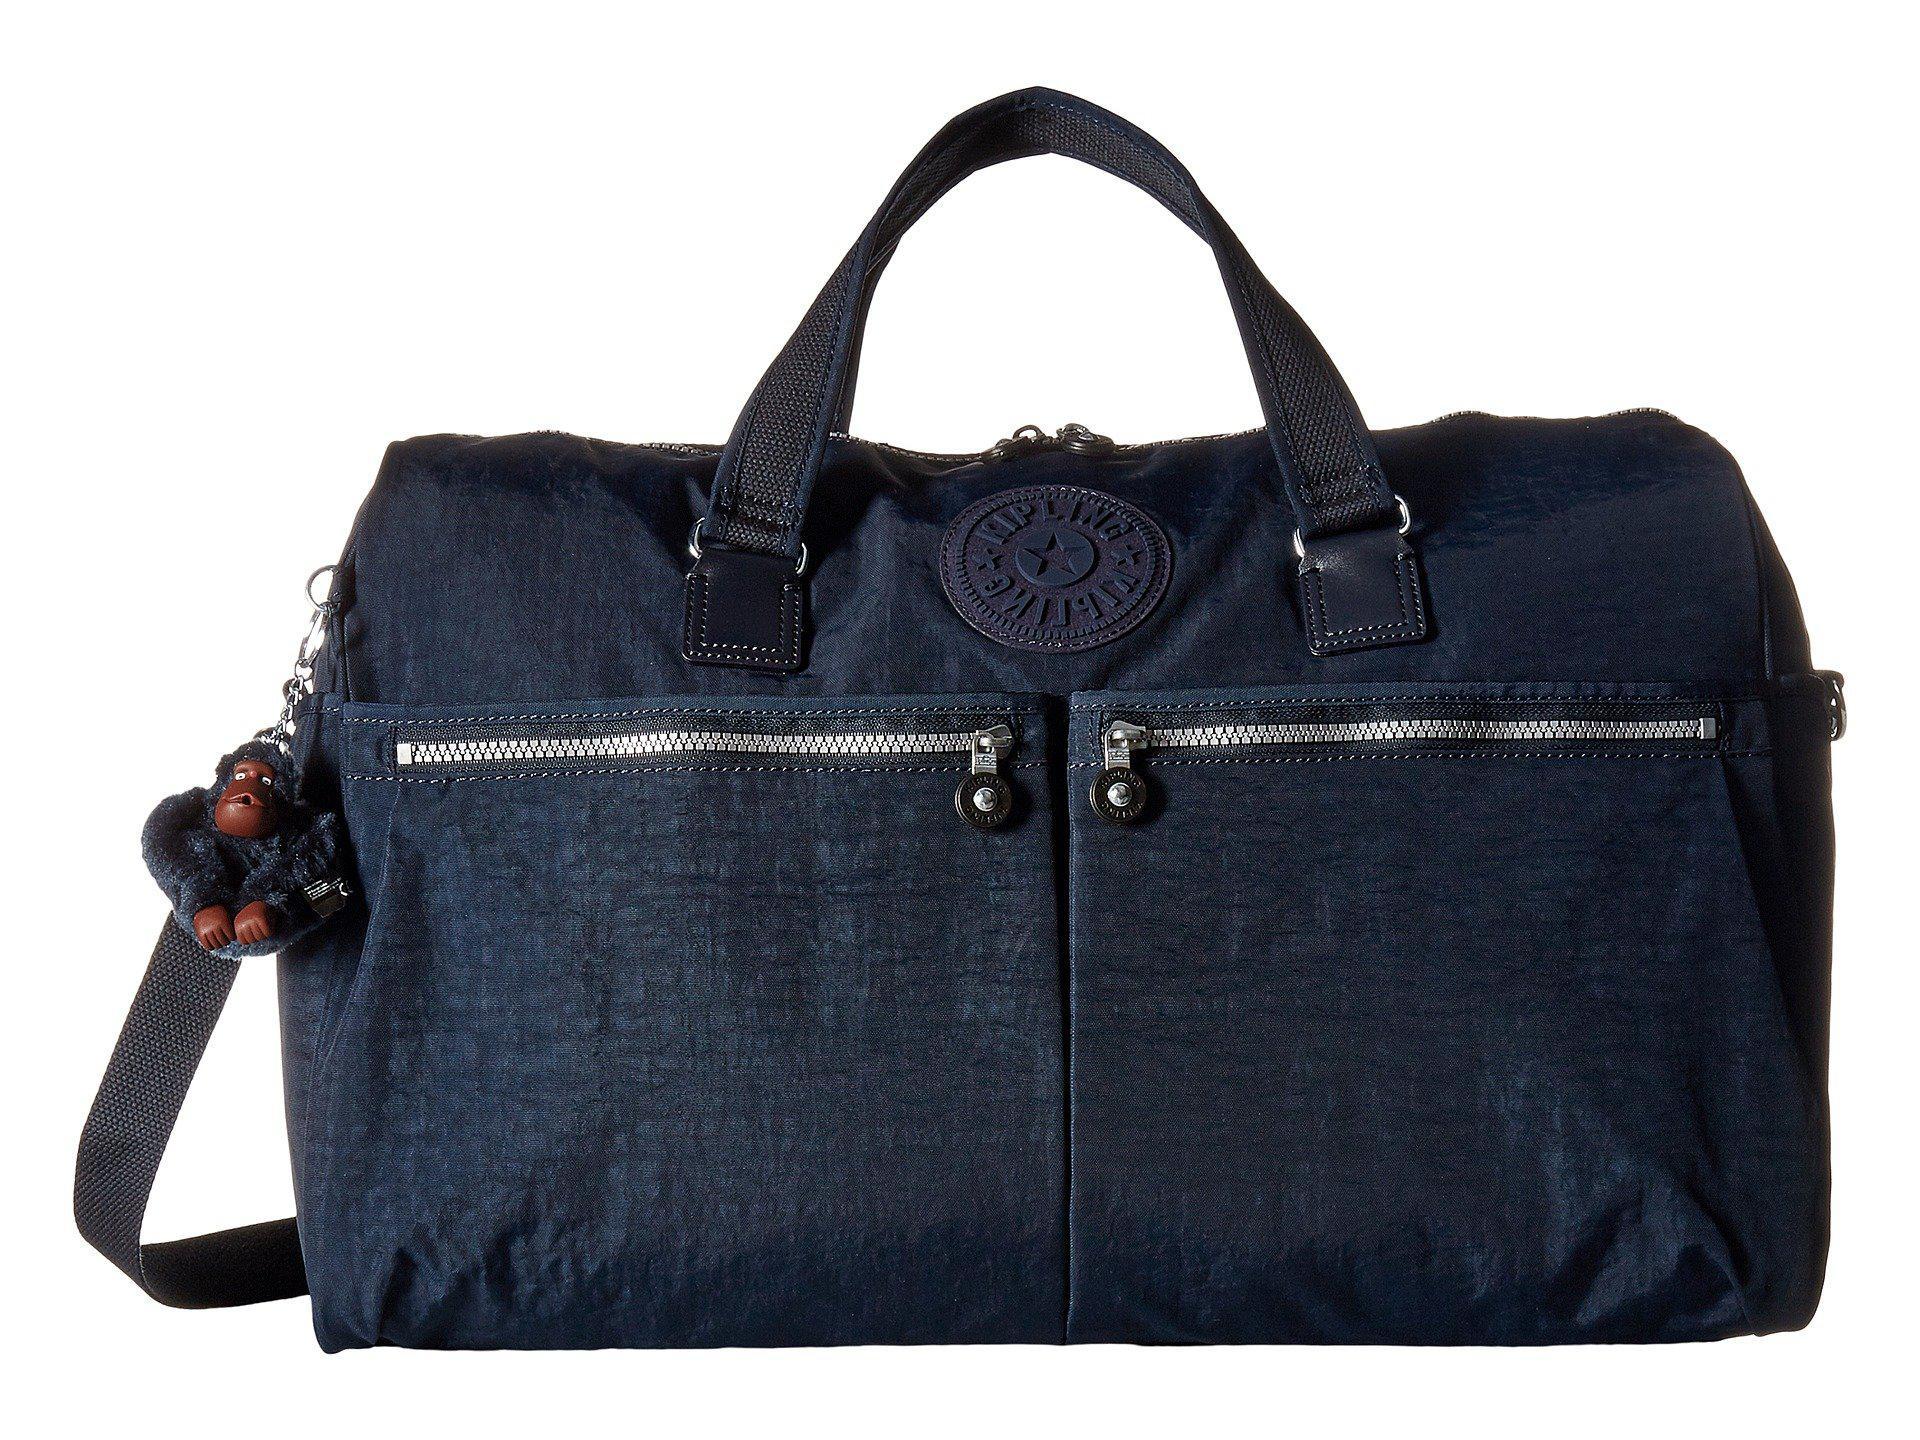 Lyst - Kipling Itska N2 (black) Bags in Blue - Save 30.81761006289308% f6e87fbb36109